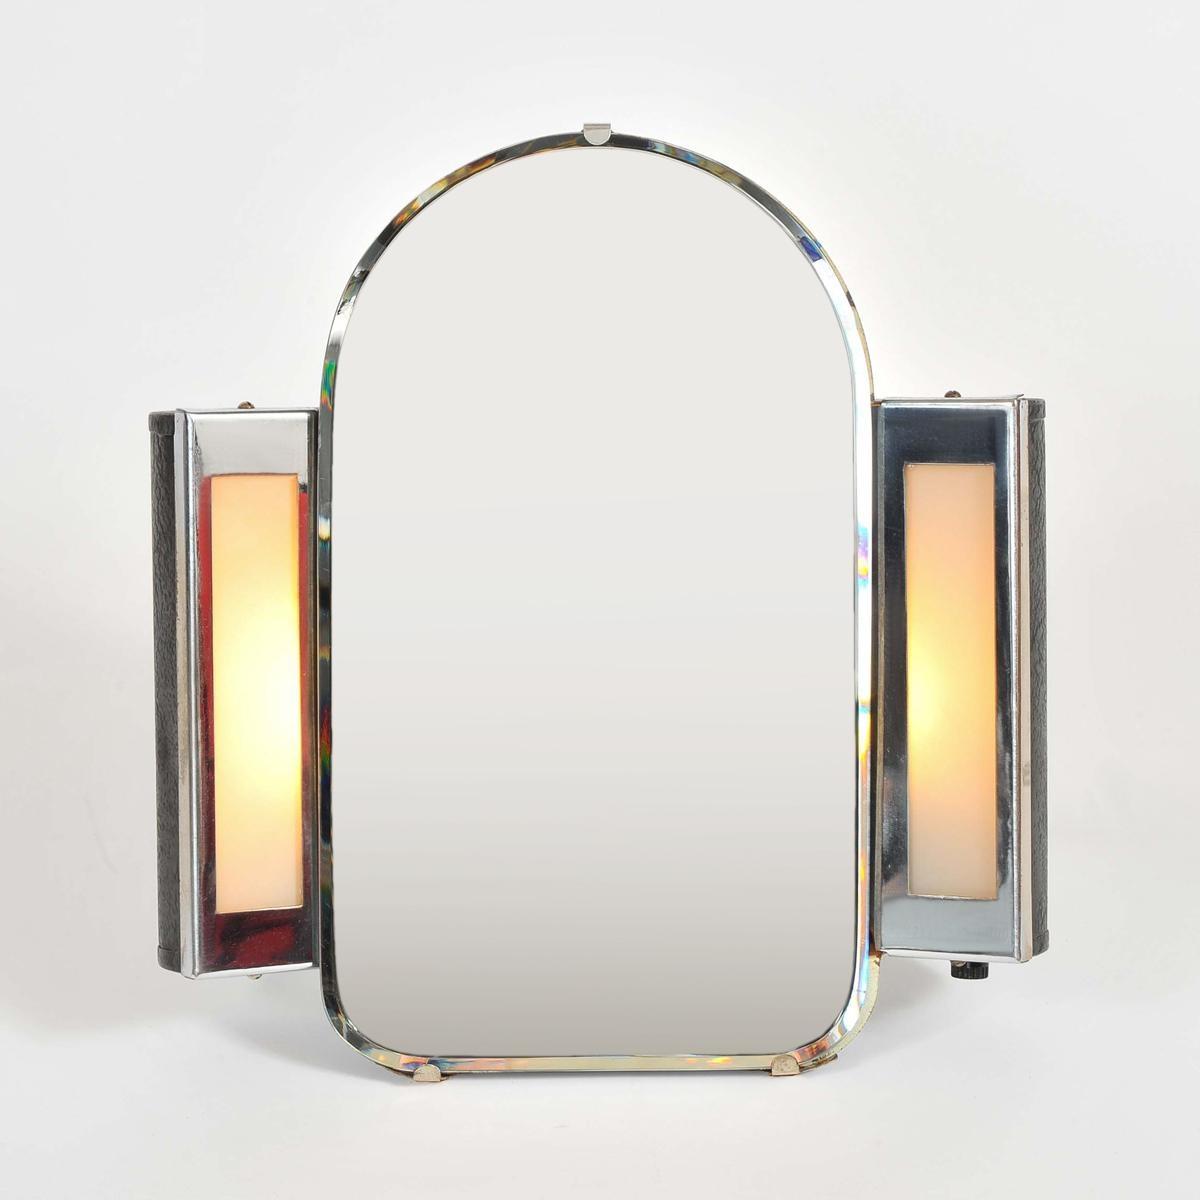 1930S Us Art Deco Illuminated Dressing Table Mirror | Valerie Wade In Art Nouveau Dressing Table Mirror (Image 1 of 20)